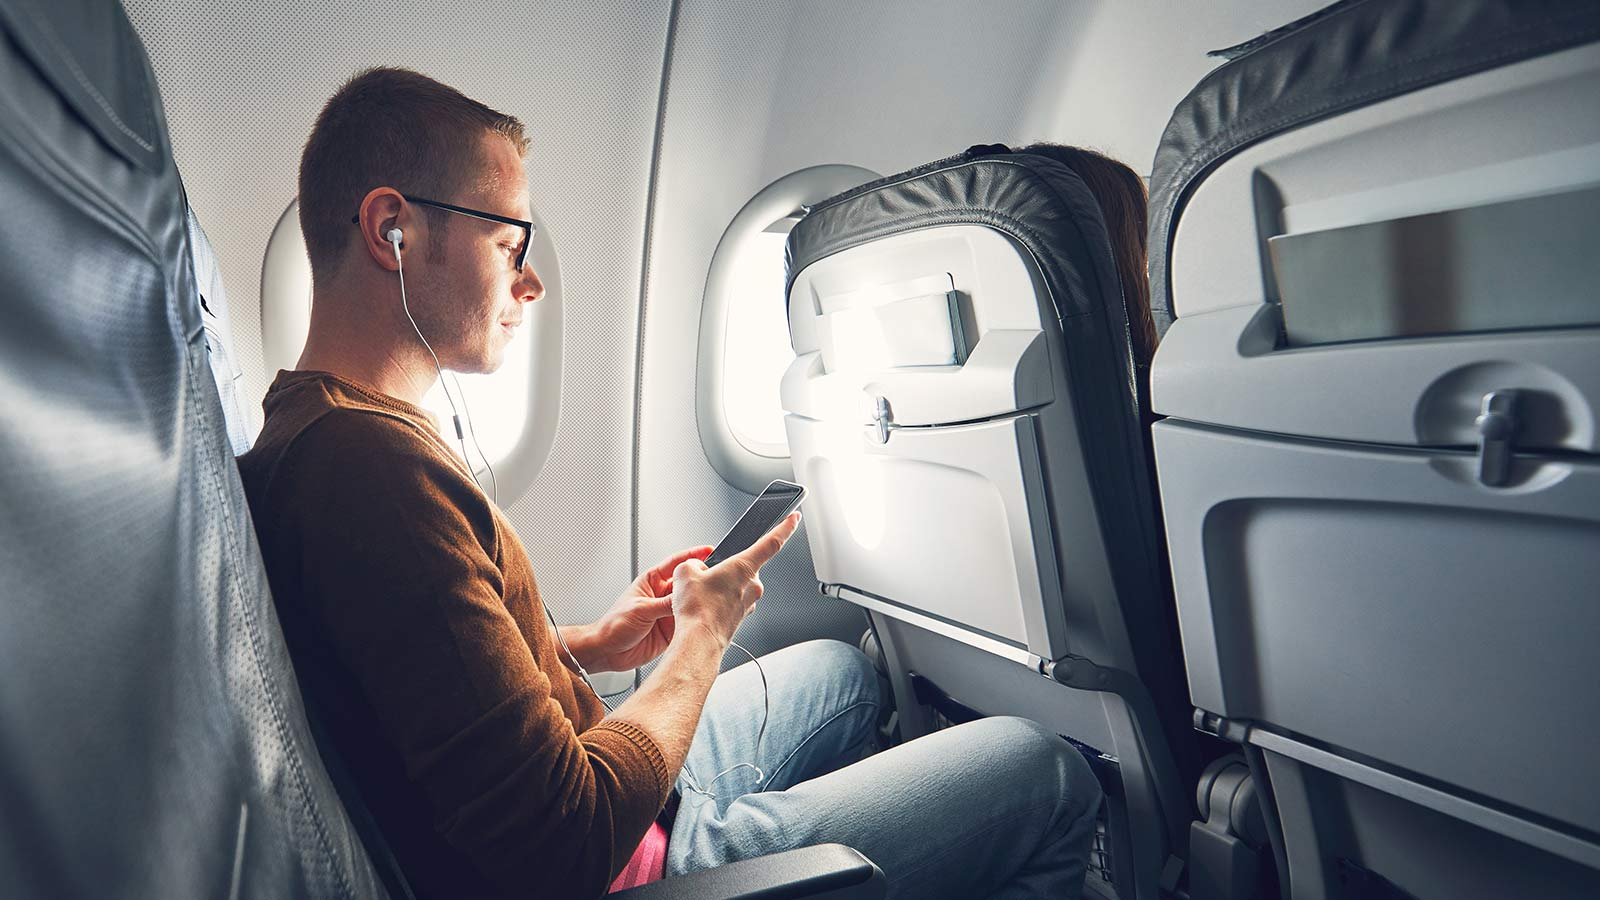 Man listening to music during flight